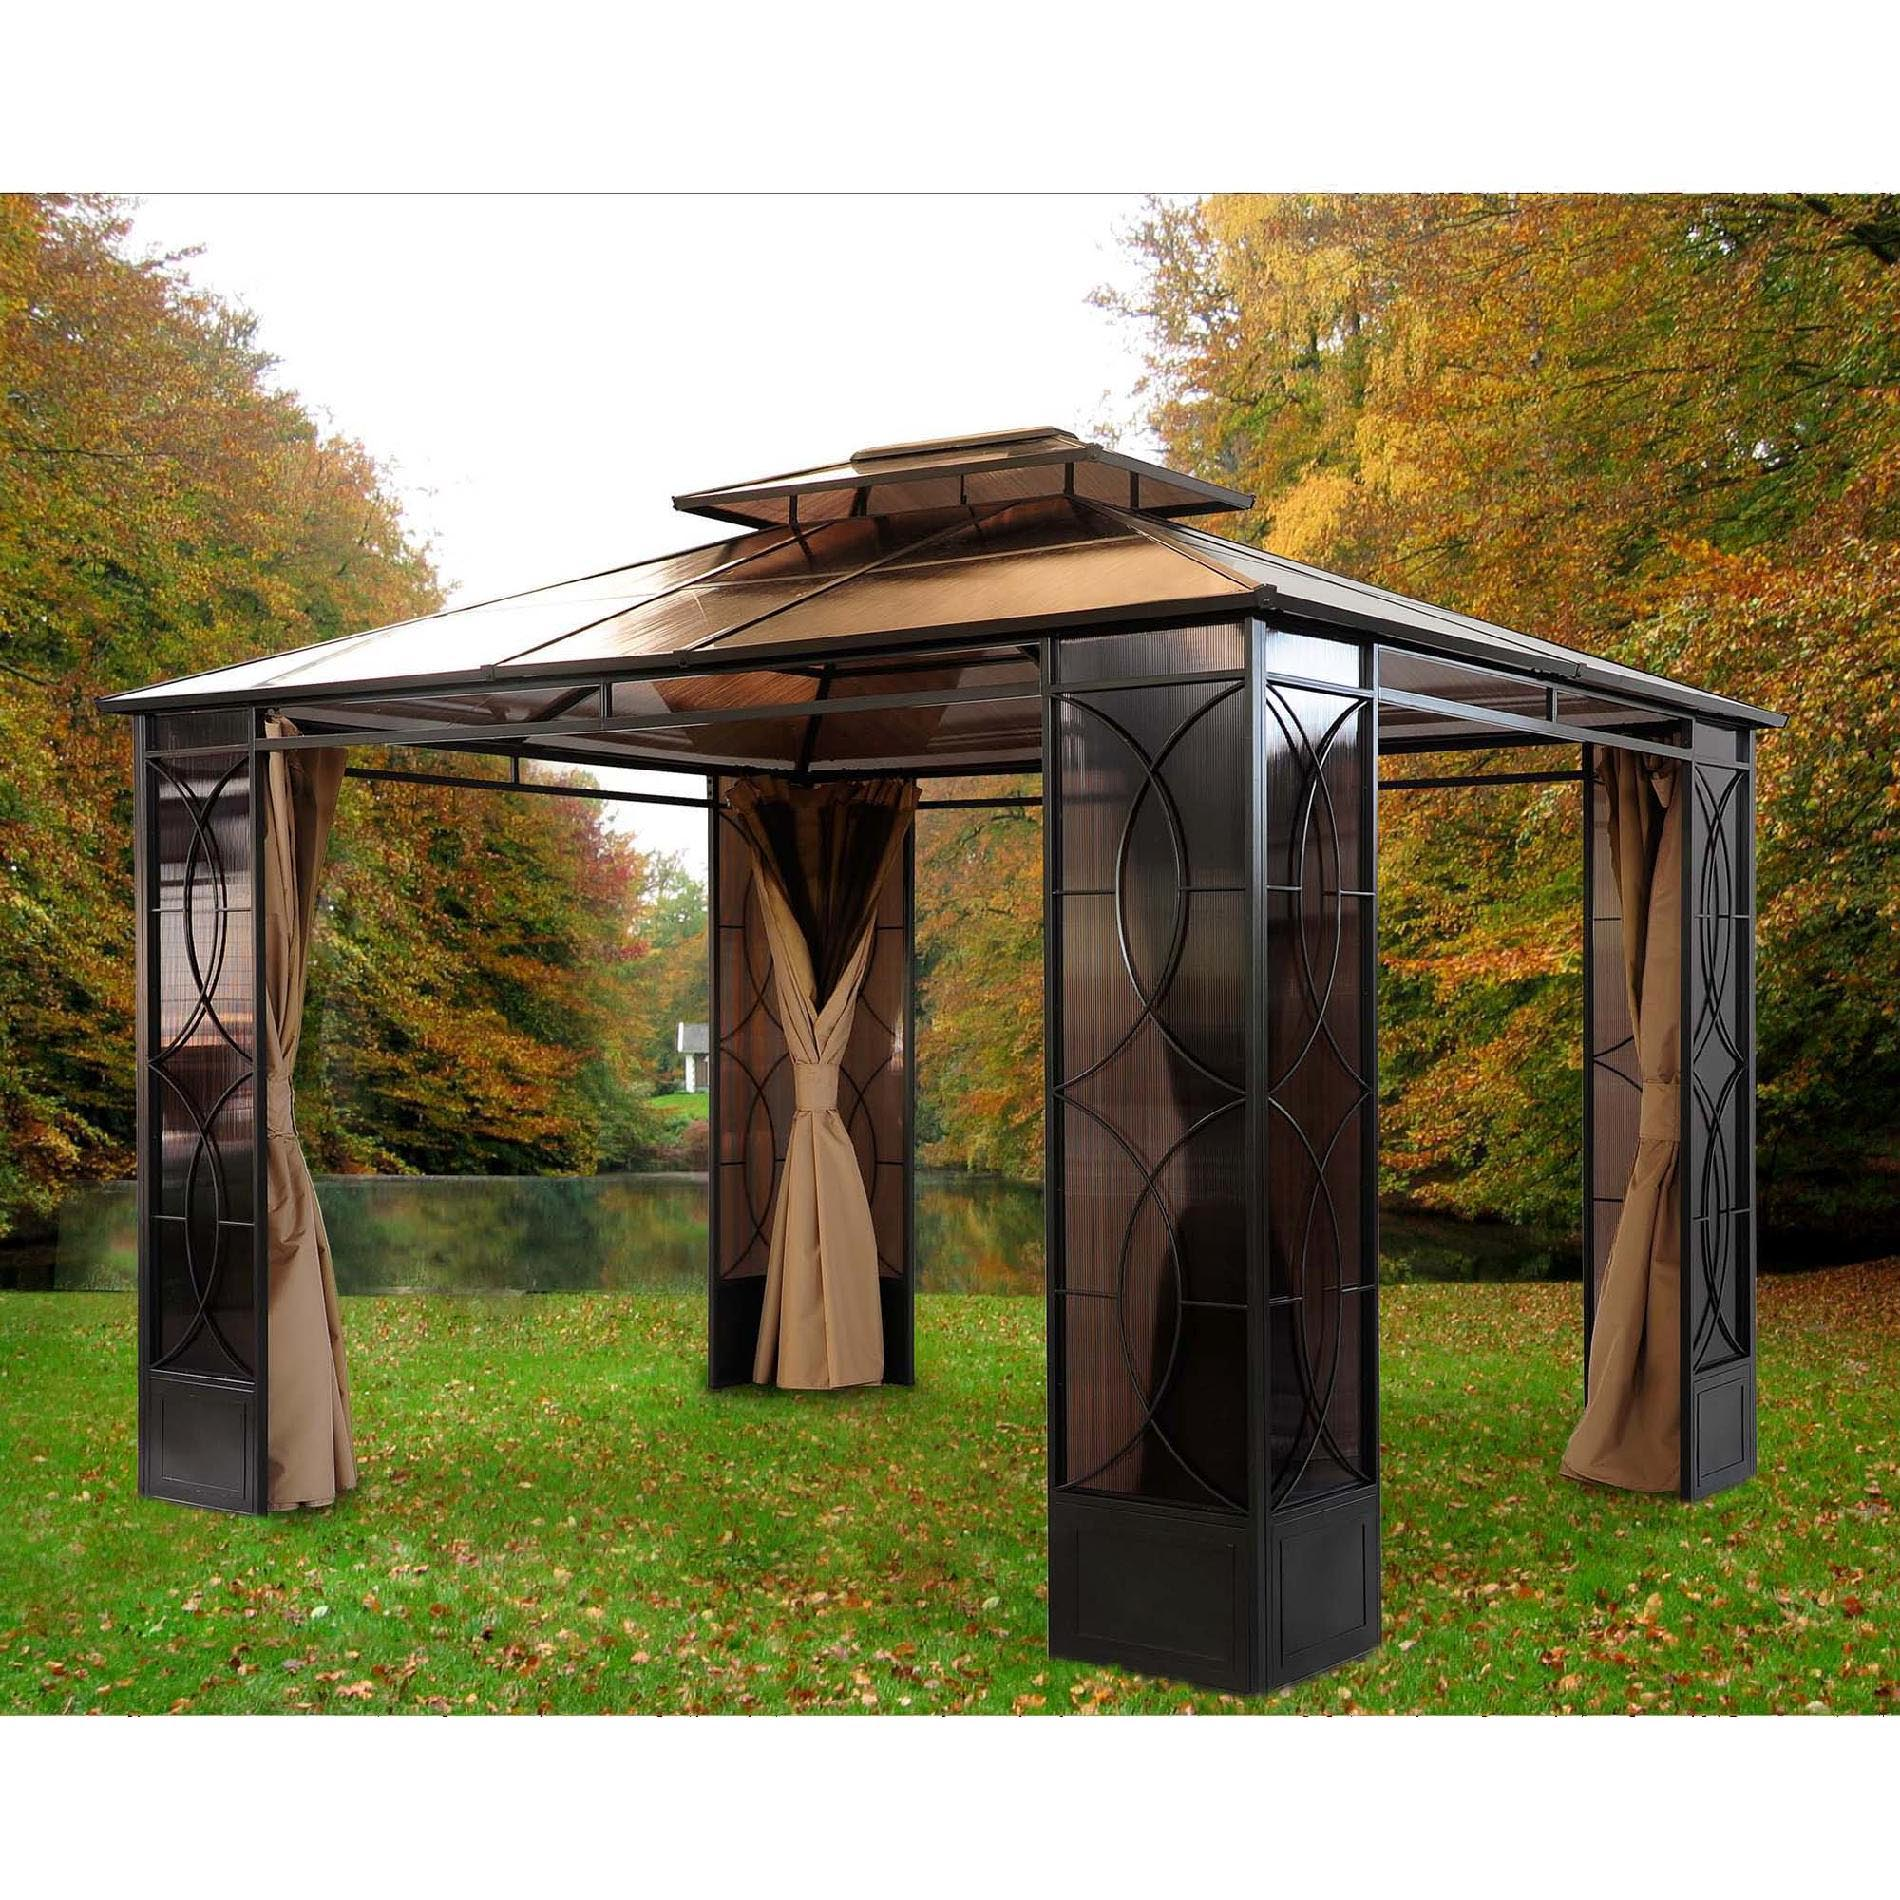 Metal Covered Gazebos : Sunjoy aluminum steel hardtop gazebo pergola design ideas